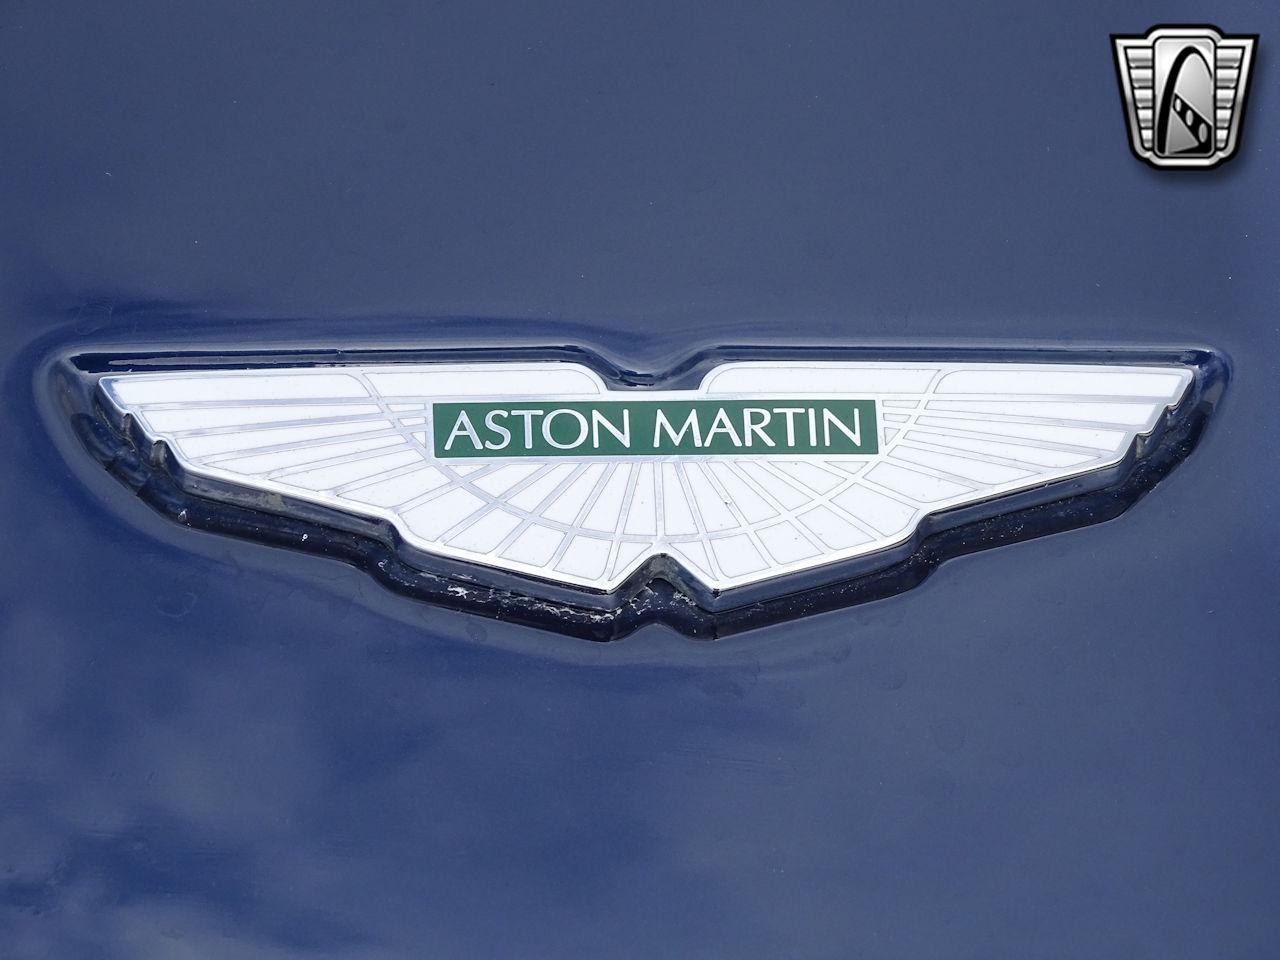 2006 Aston Martin DB9 89